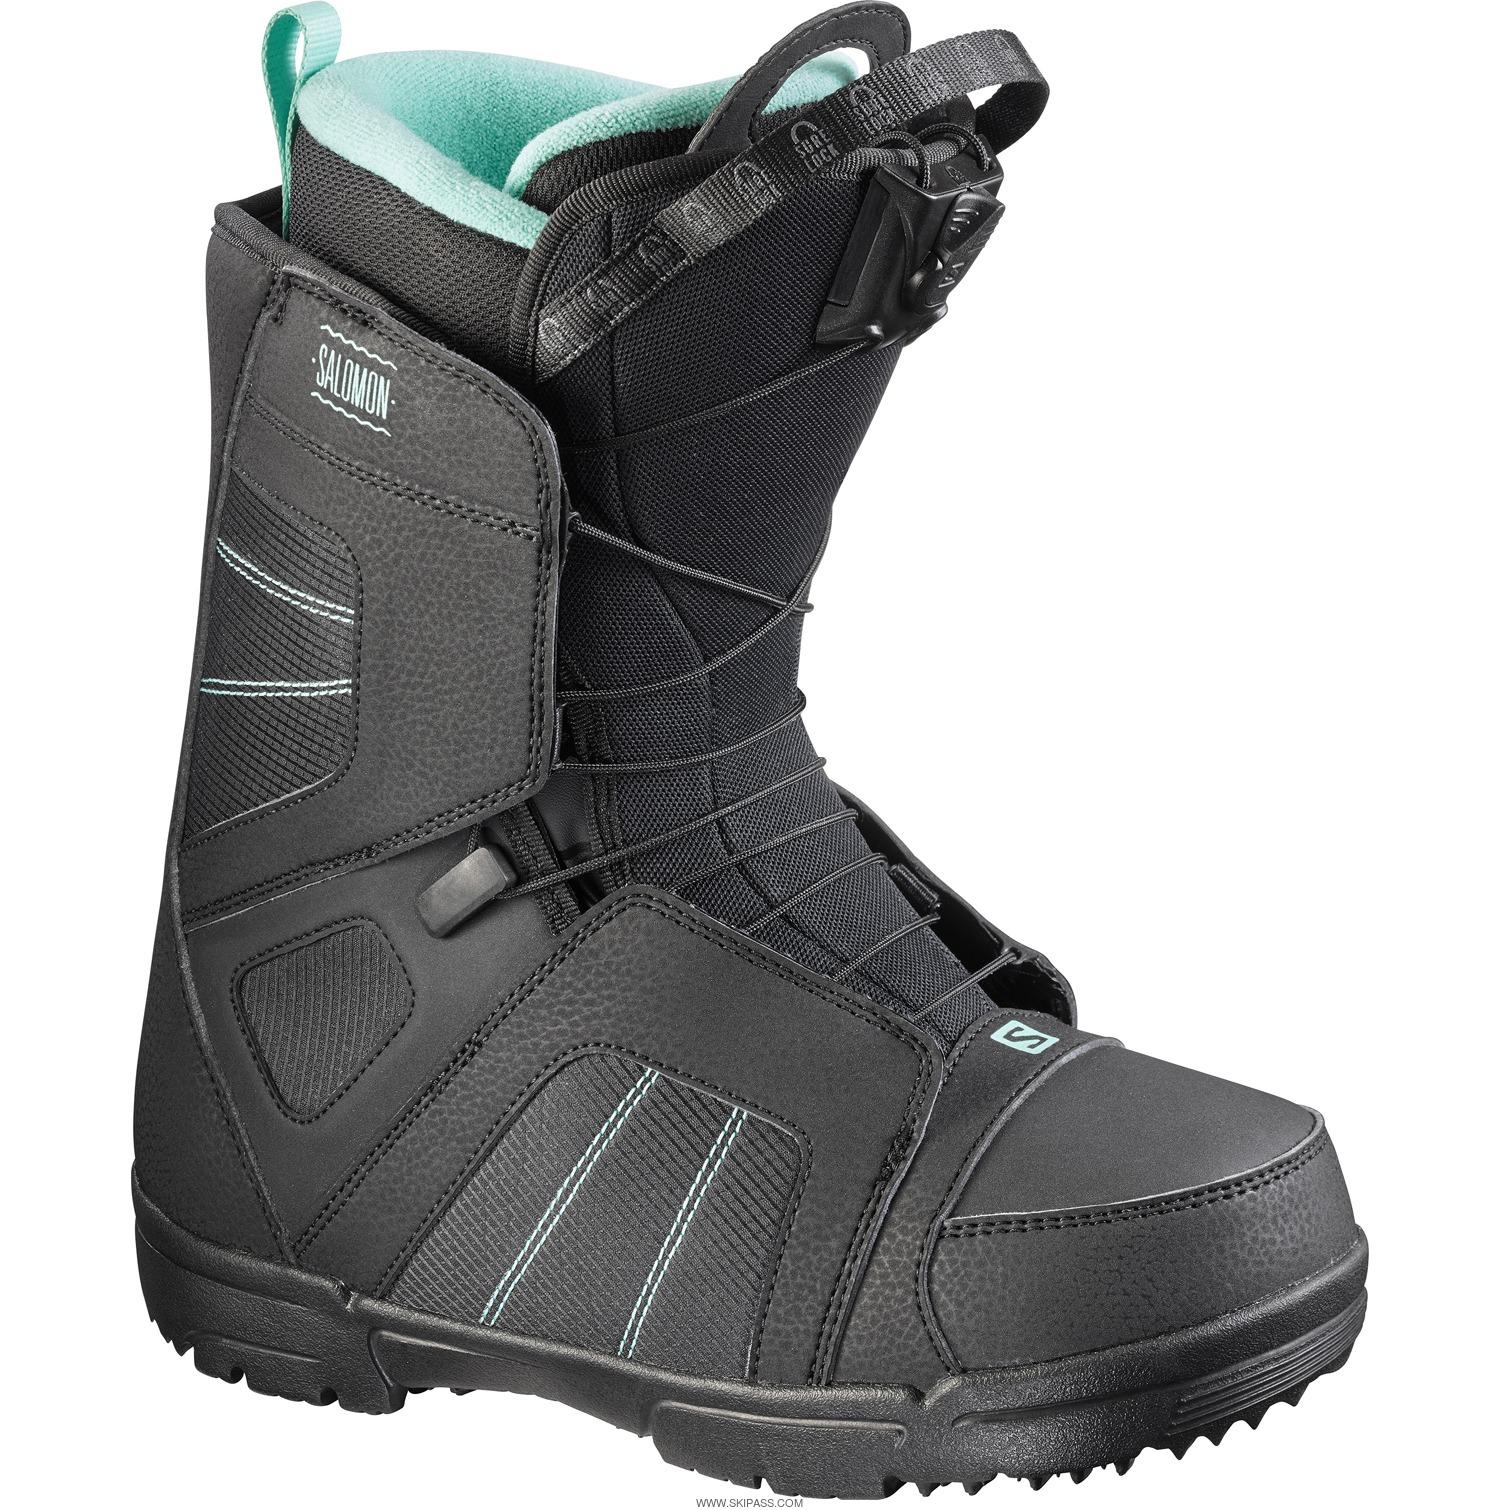 Adidas Kids:35 Salomon Scarlet Black - - 25.5  3.5 jXcc78Sl